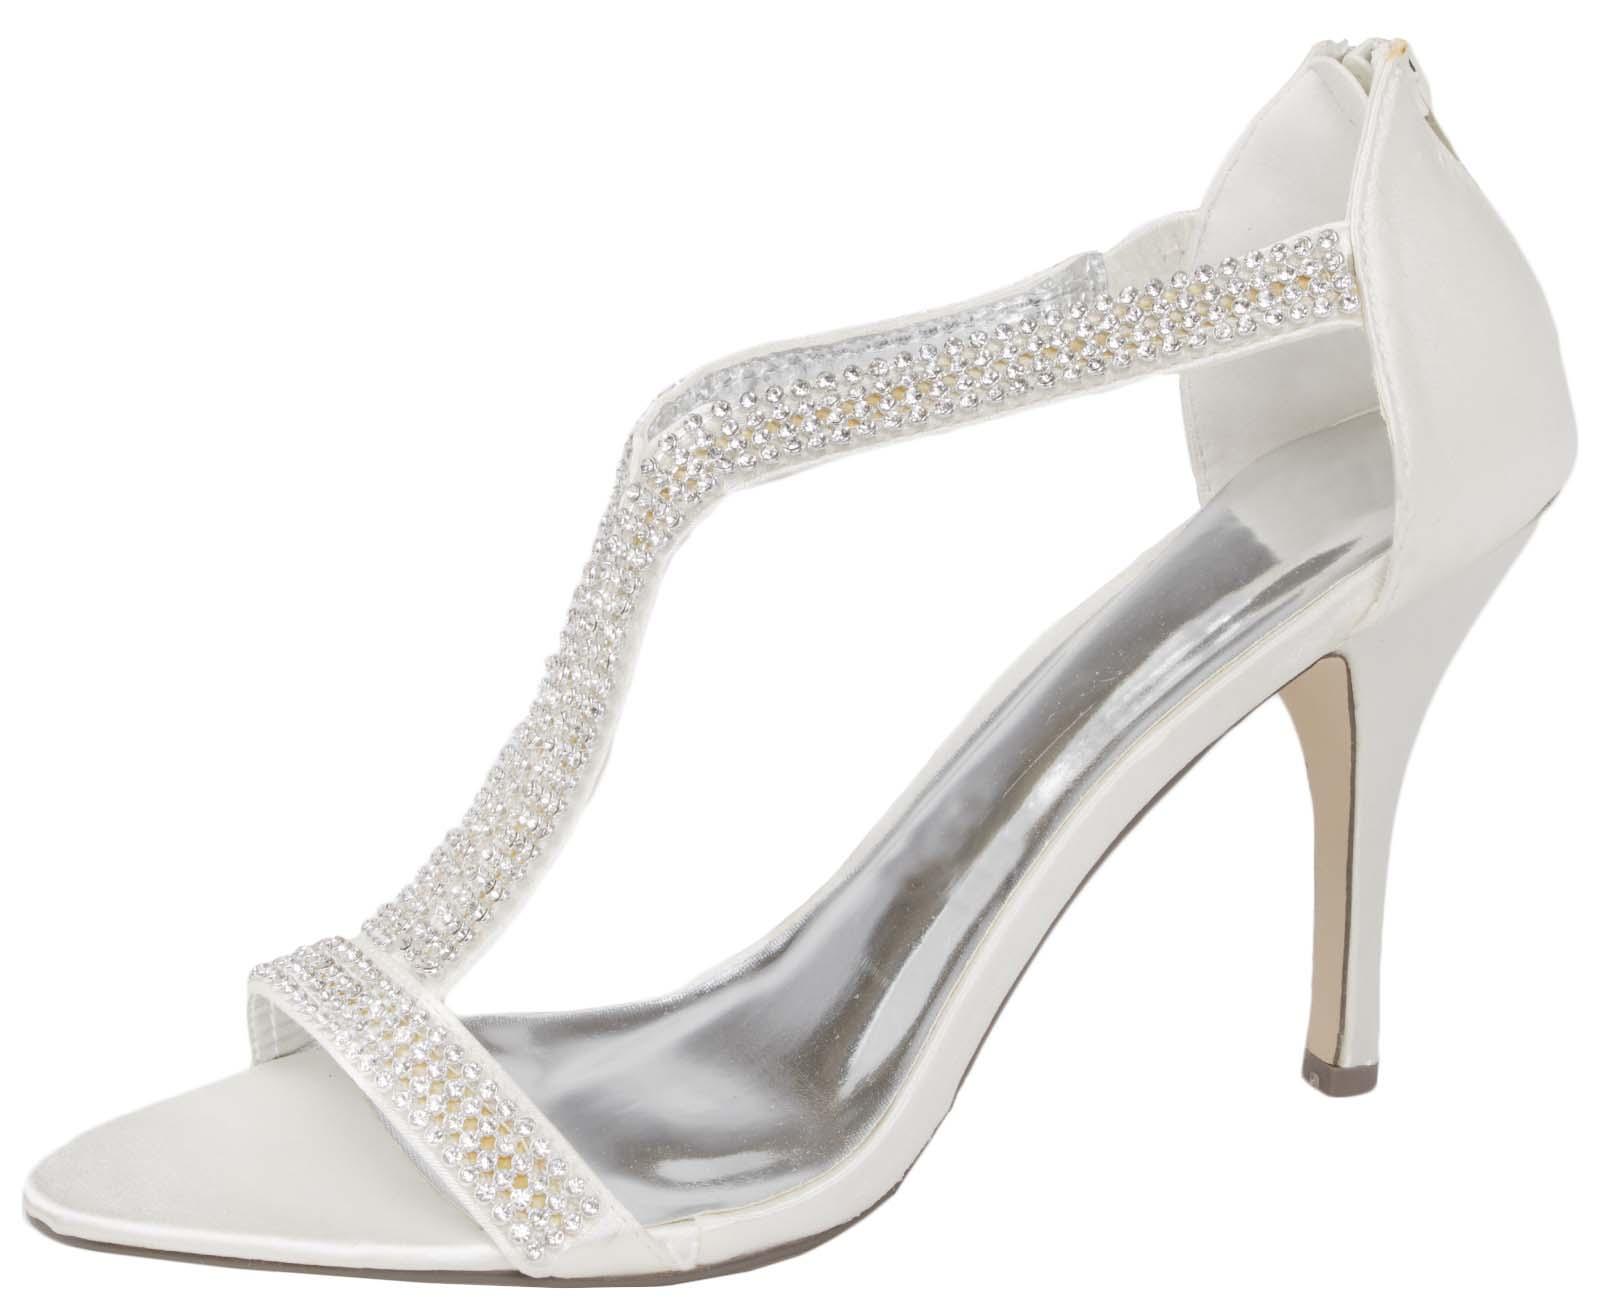 Womens Diamante Wedding Shoes T Bar Stiletto High Heels Ptoe Party Size